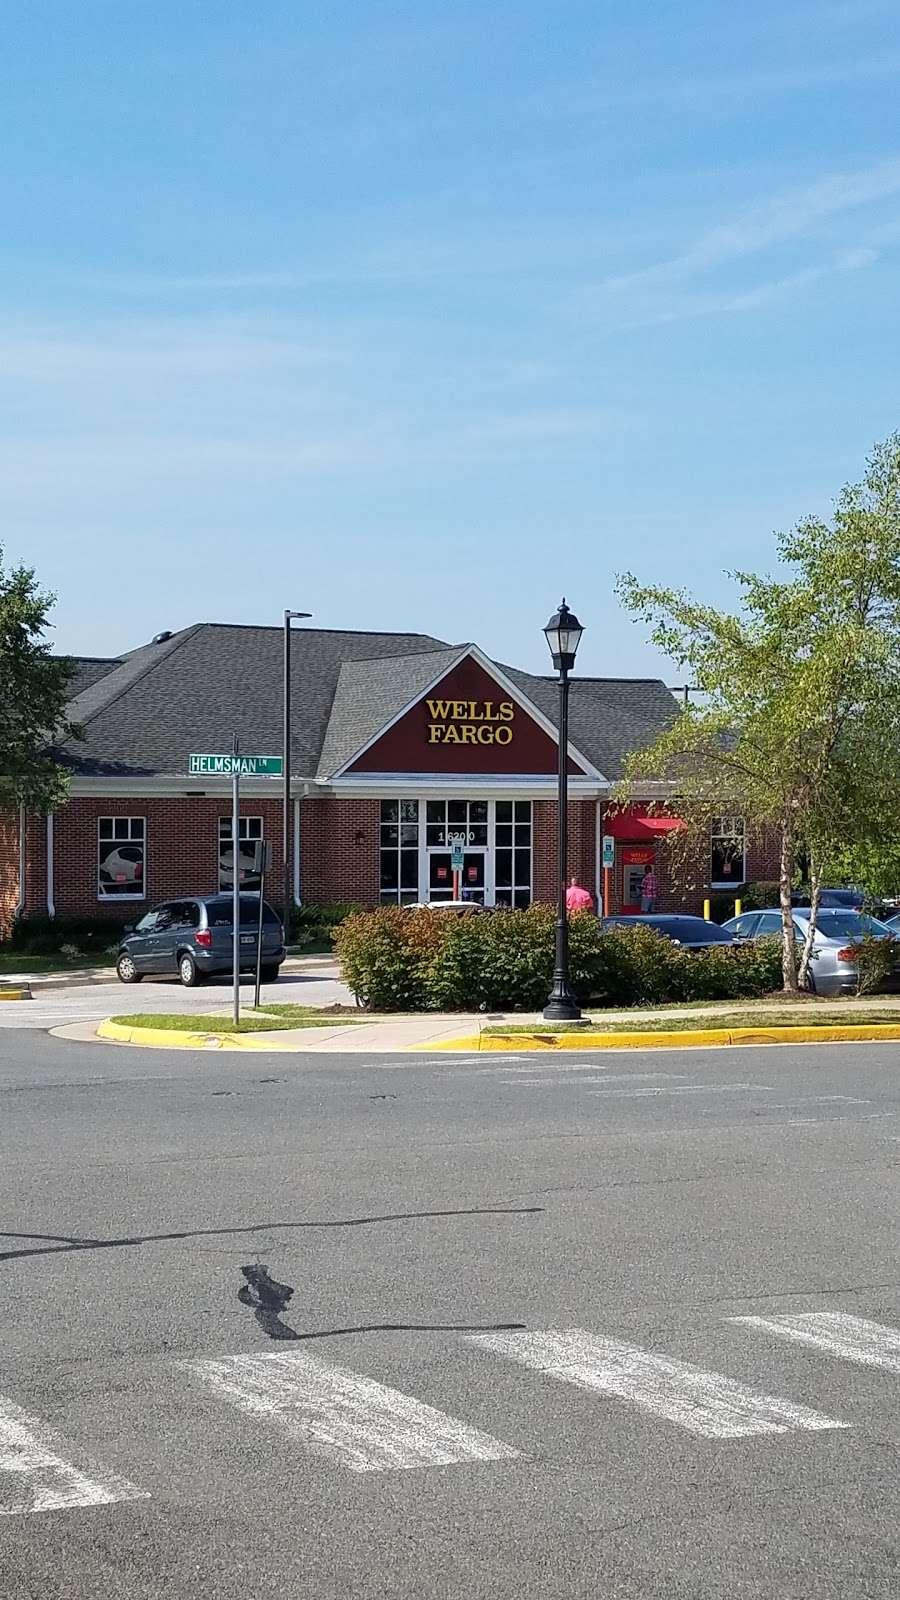 Wells Fargo Bank - bank  | Photo 1 of 3 | Address: 16300 Navigation Dr, Woodbridge, VA 22191, USA | Phone: (703) 580-5468